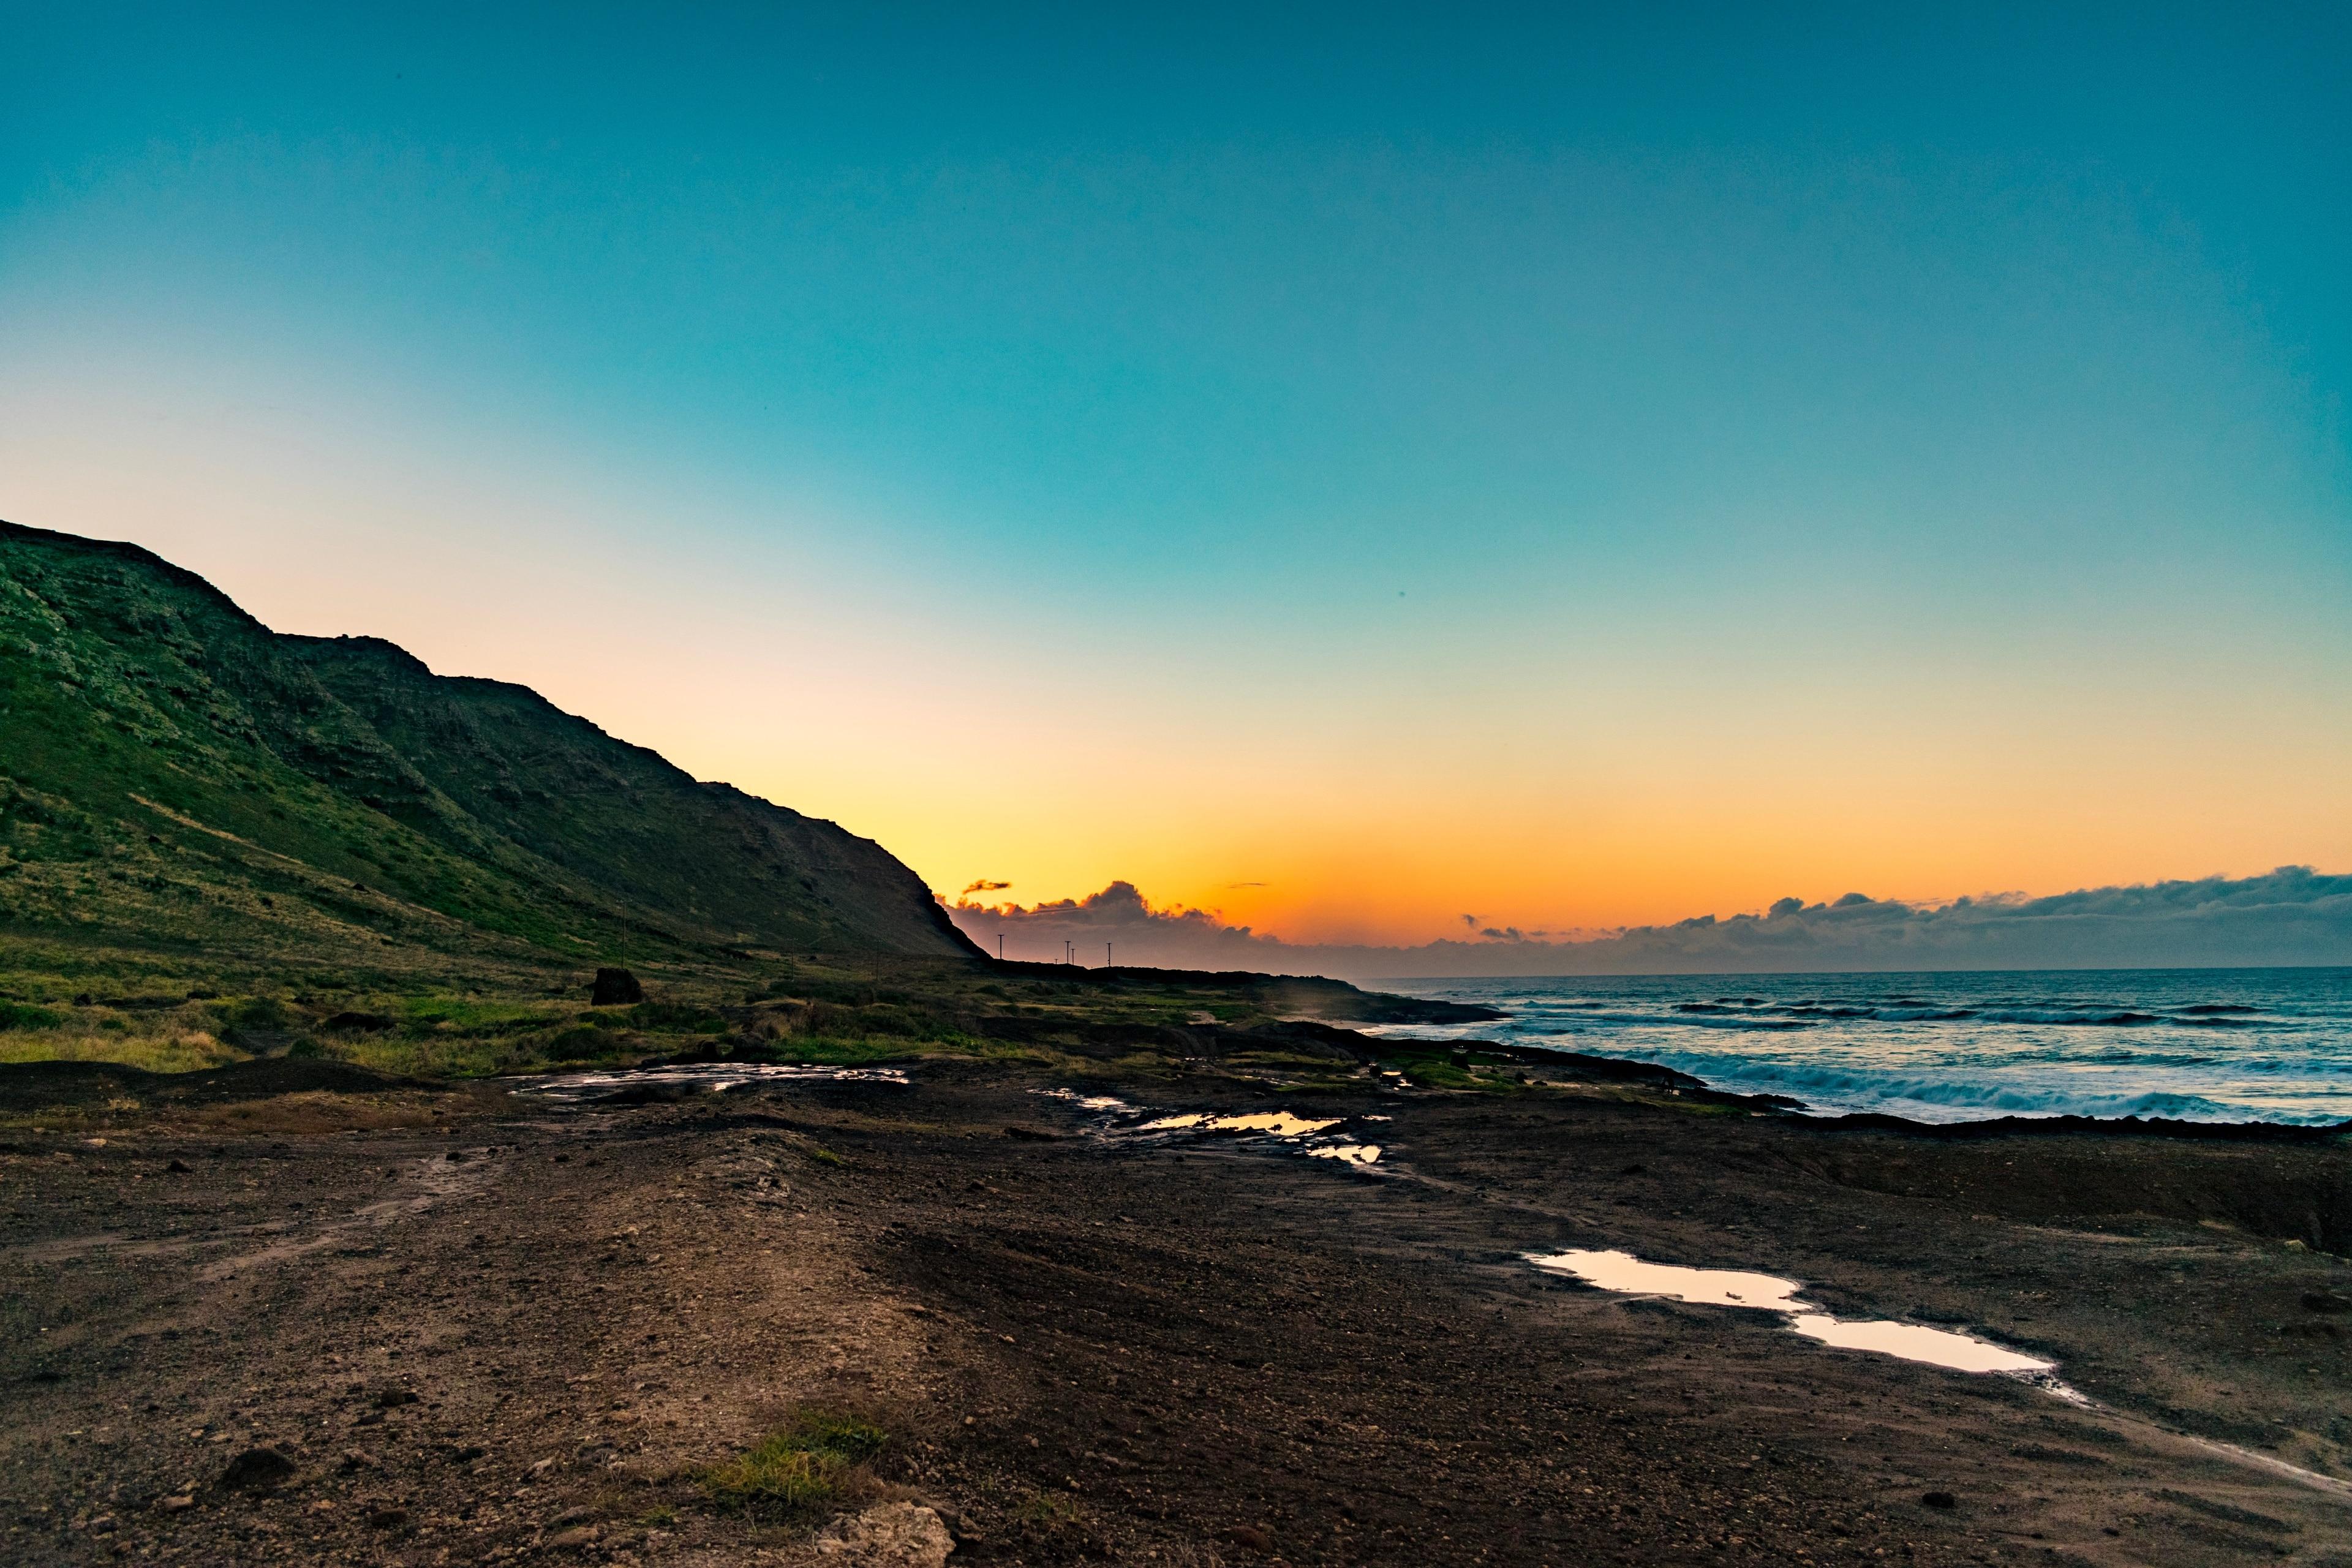 Waialua, Hawaii, United States of America